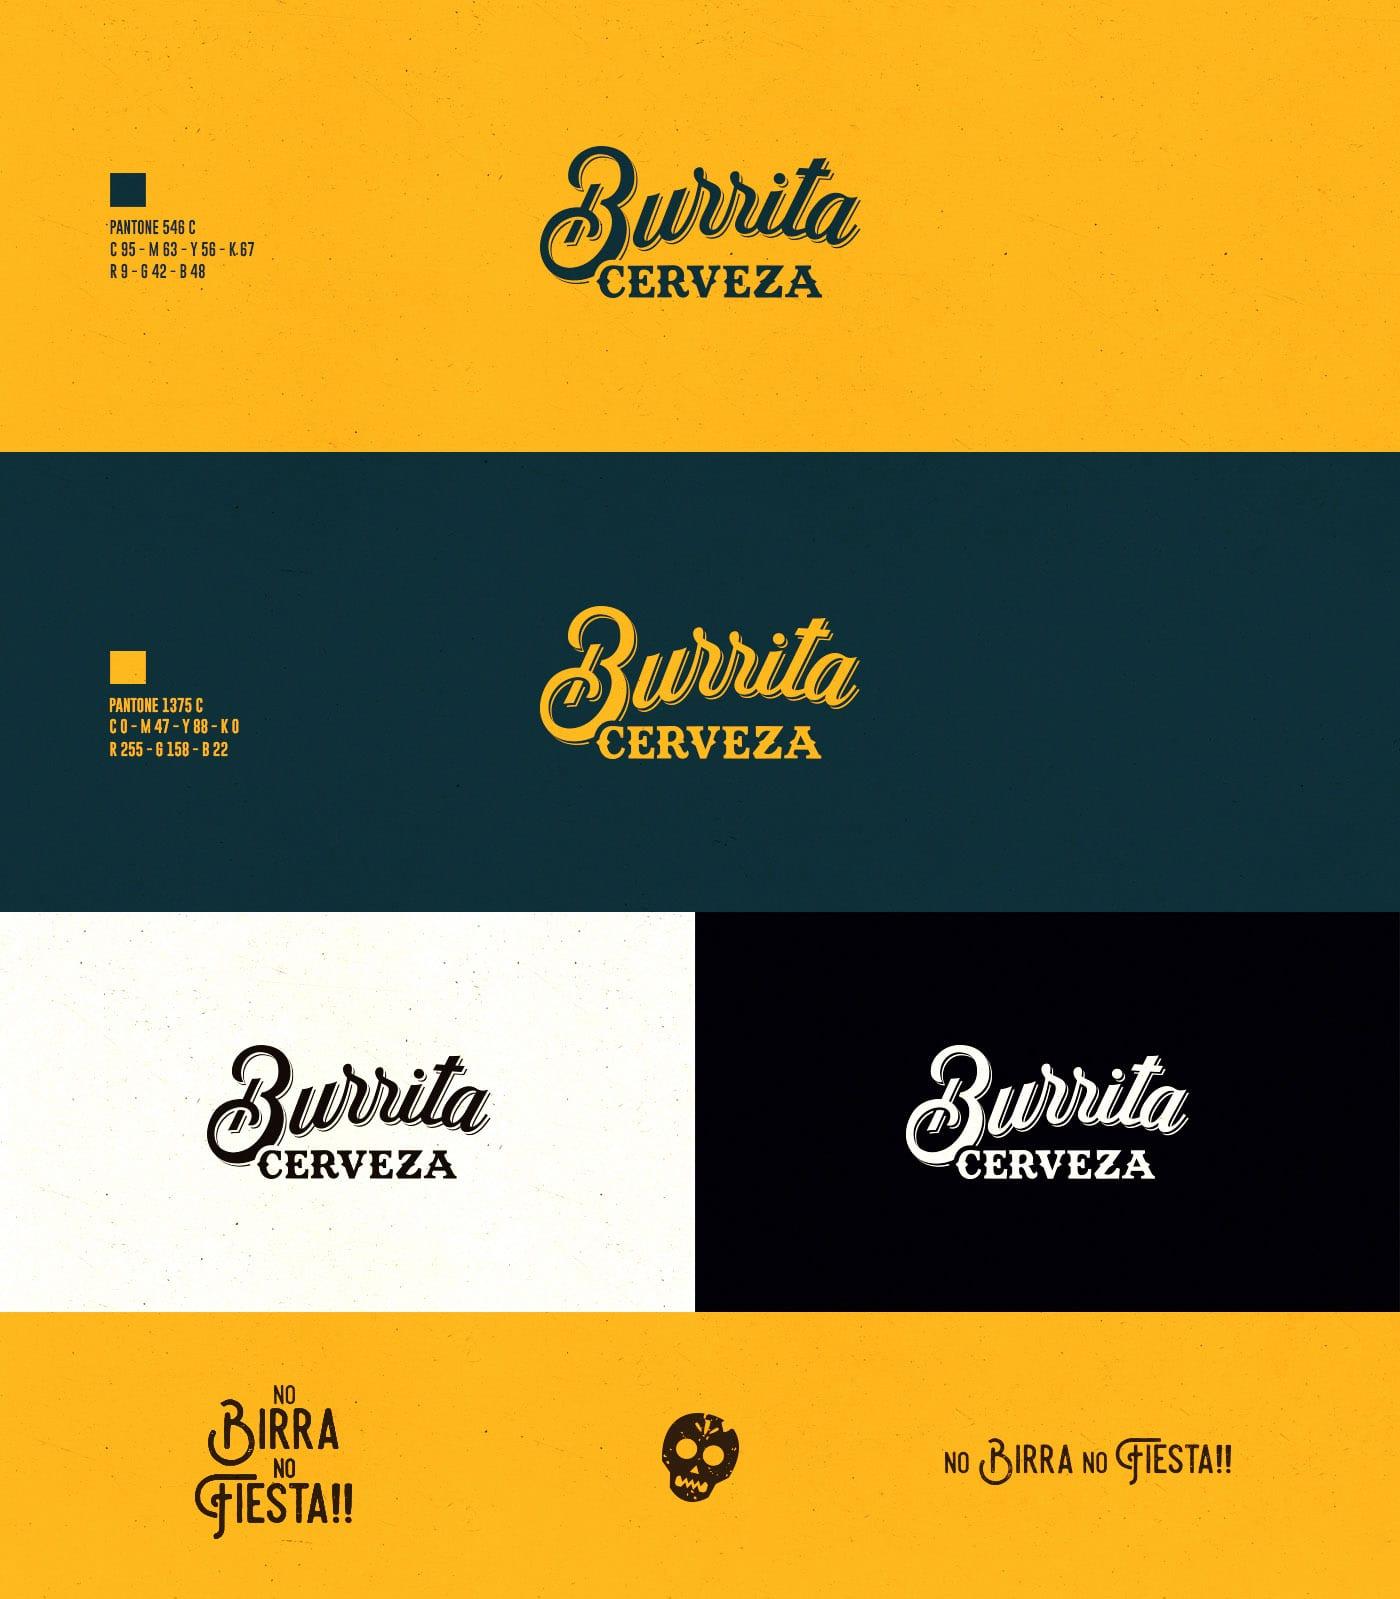 Cerveza Burrita 02 - Ach, tie obaly – Cerveza Burrita